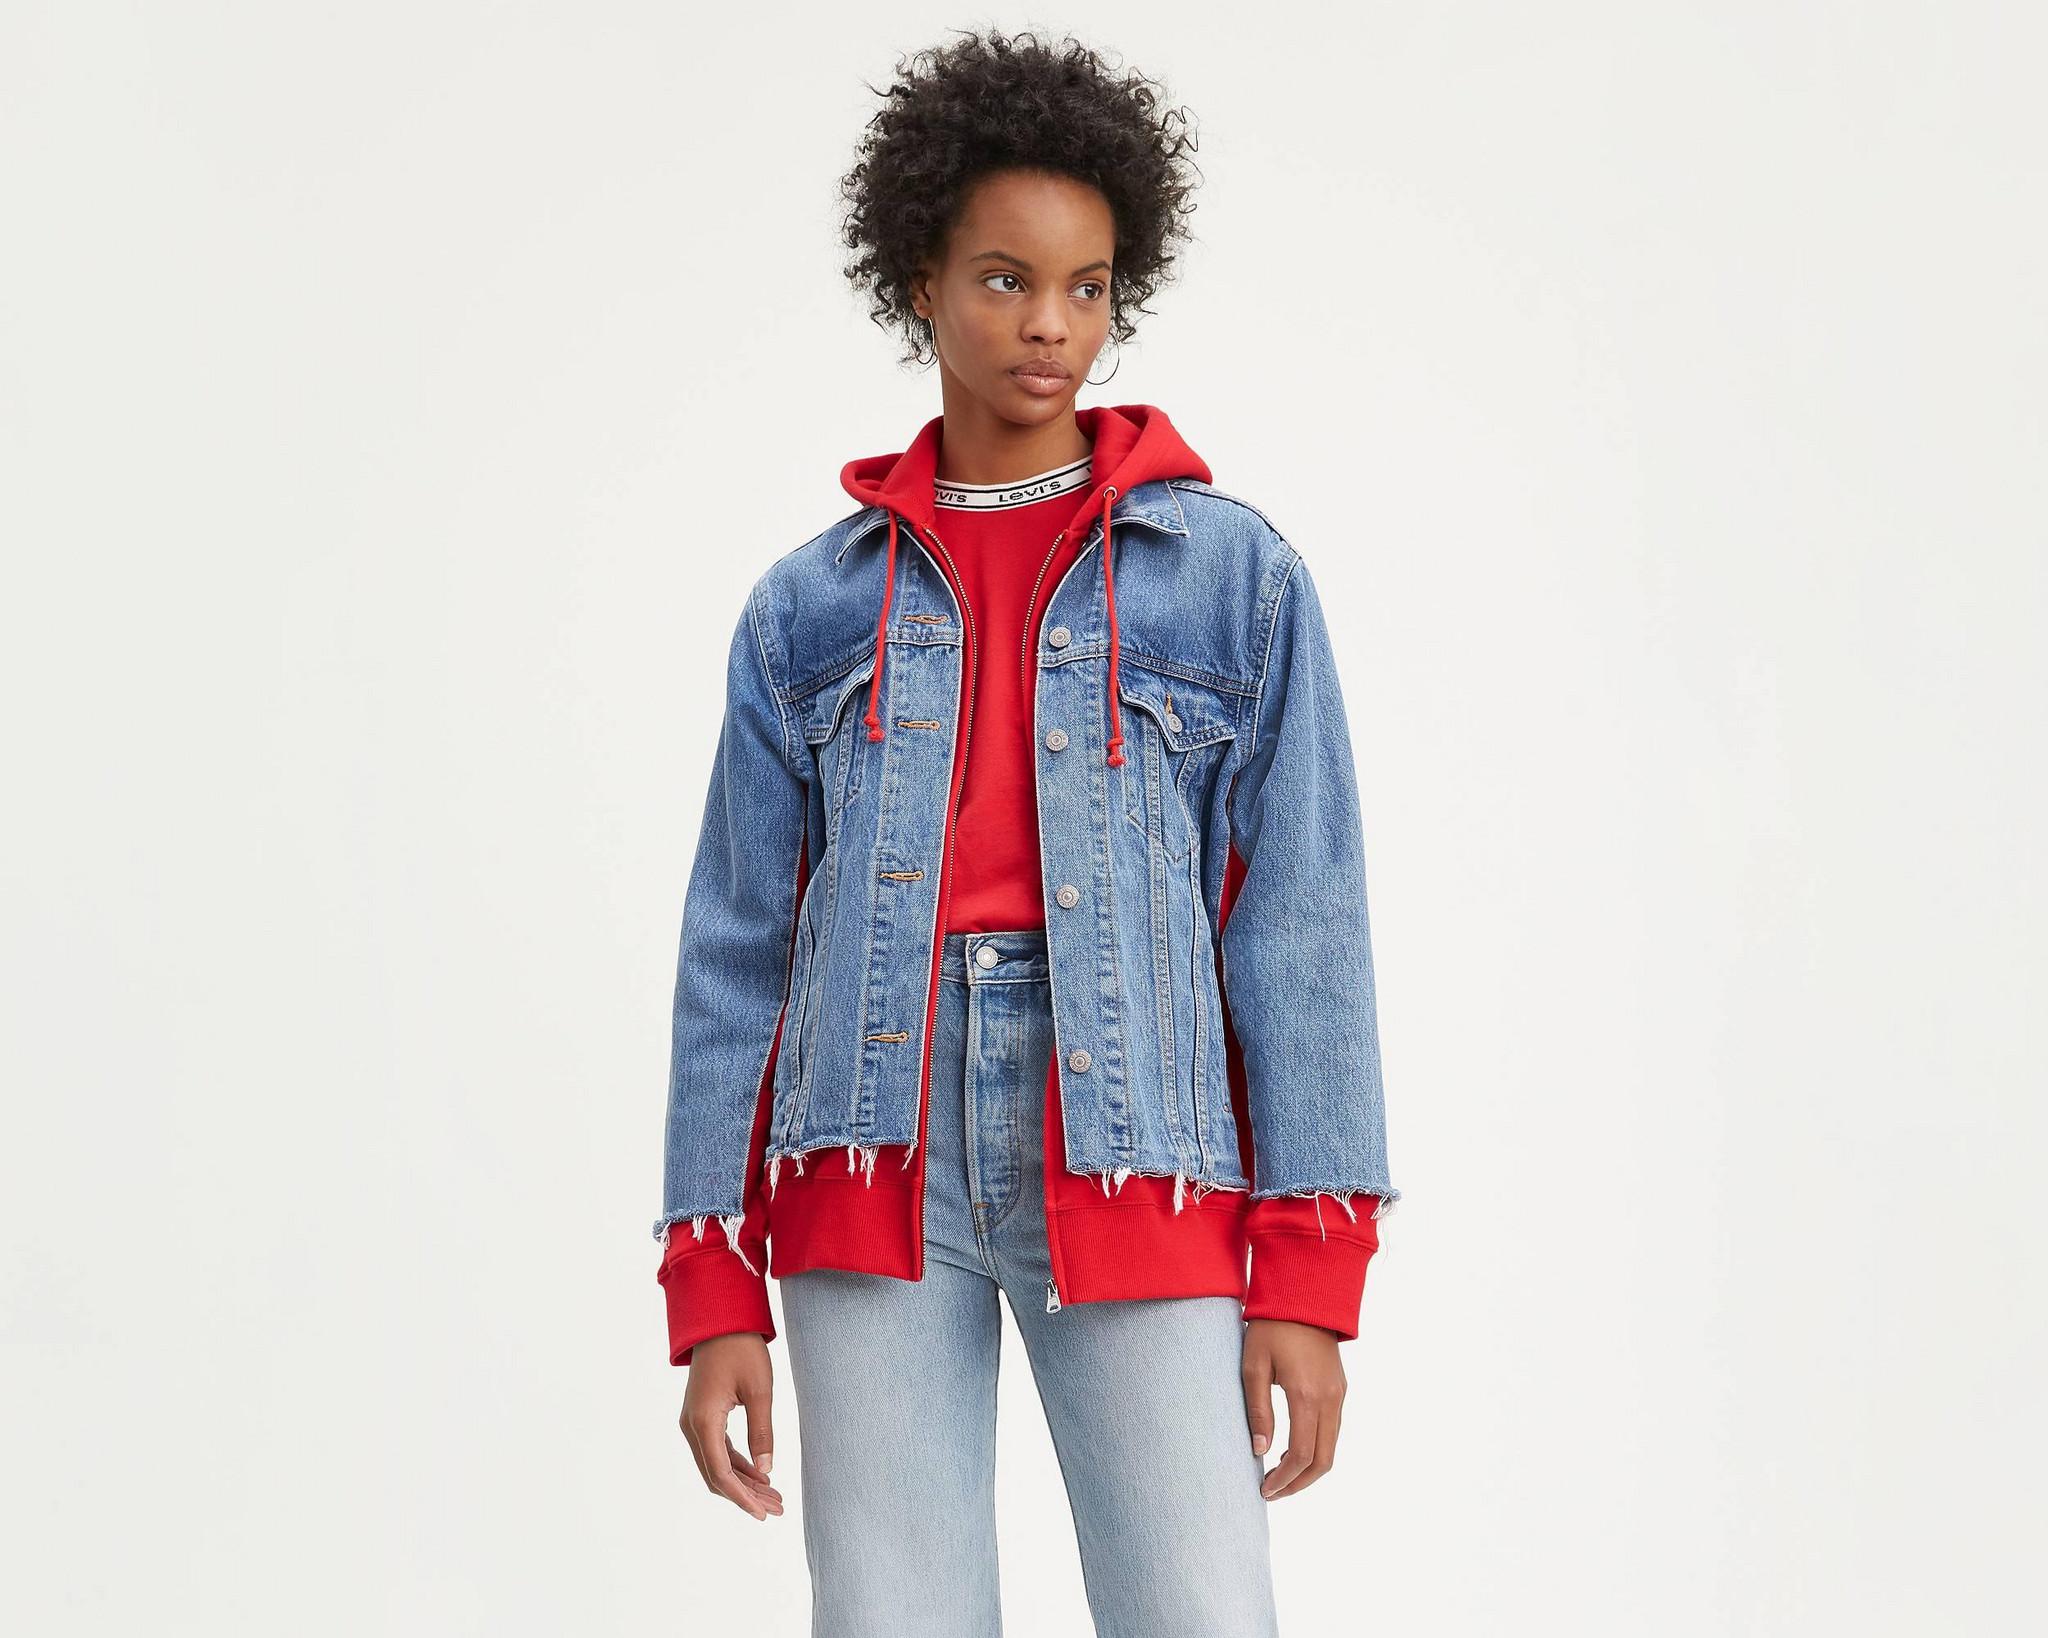 levis_casacos-de-ganga-trucker_feminino_ex-boyfriend-hybrid-hooded-trucker-jacket-72737-0000_piggy-back-red_1.jpg